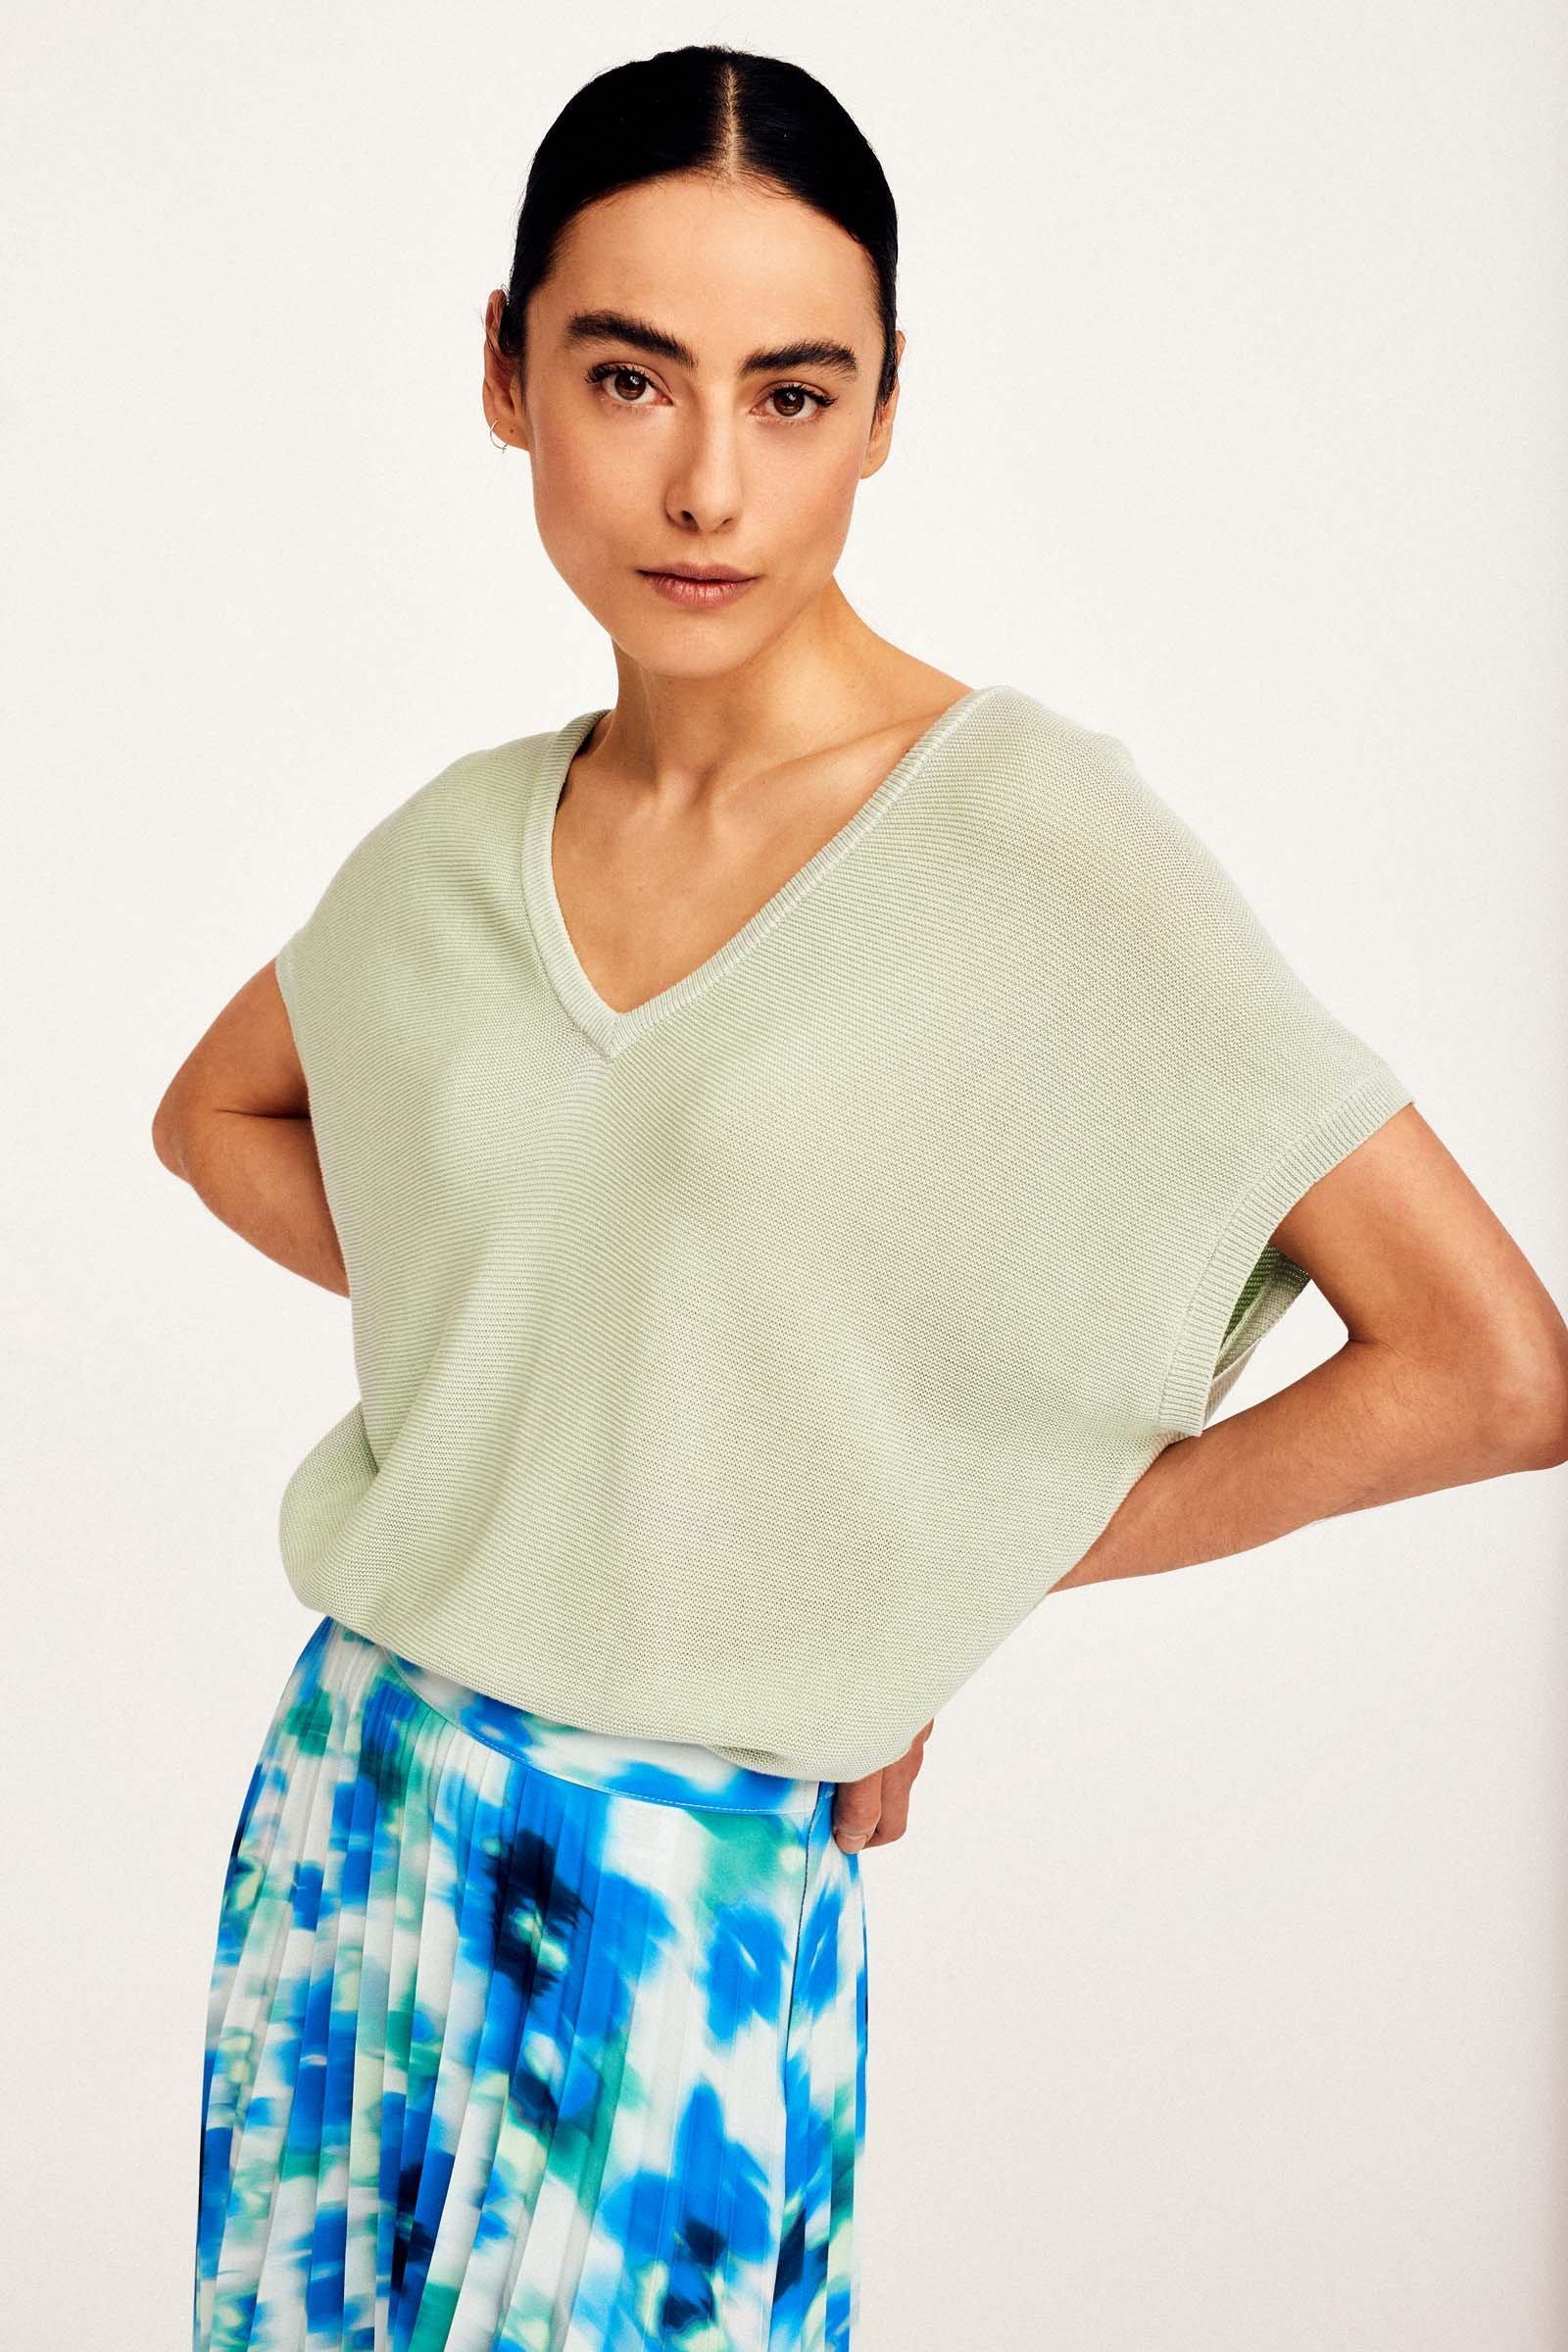 https://webmedia.cks-fashion.com/i/cks/119328GNM_30_f_model